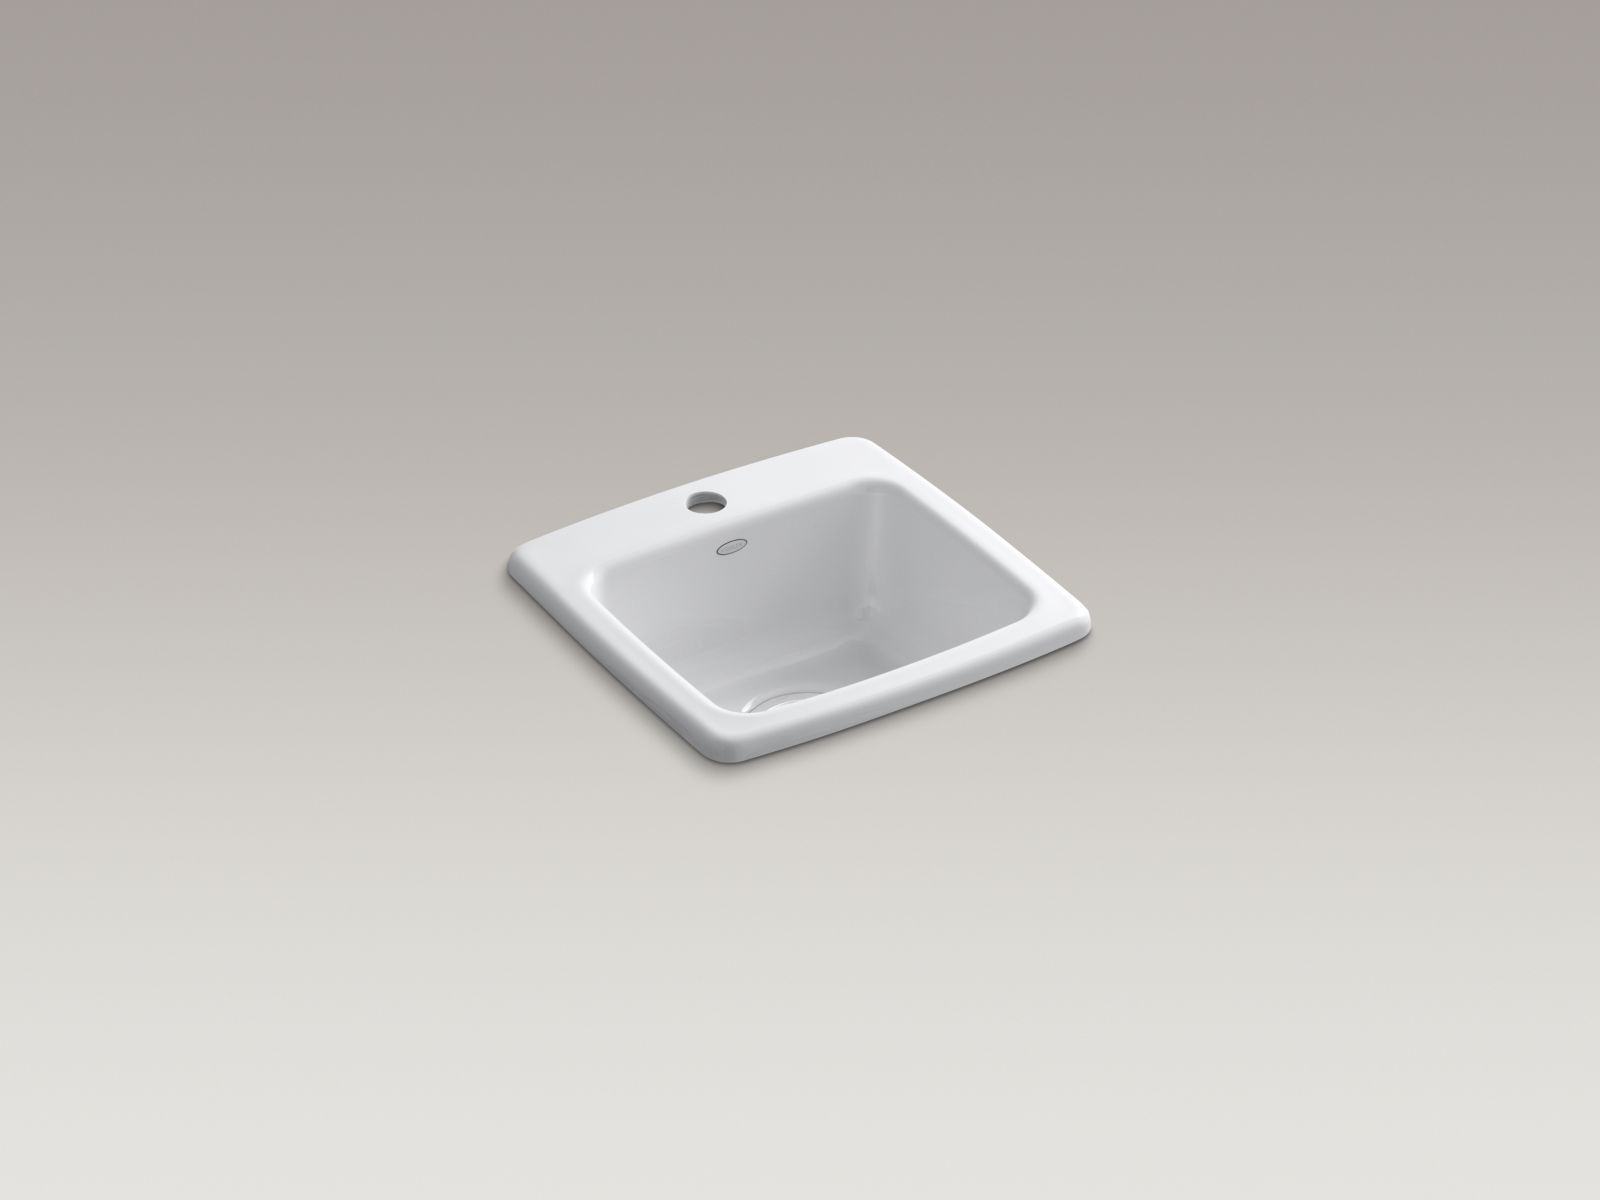 Kohler K-6015-1-0 Gimlet Self-rimming Single-bowl Bar Sink with Single Faucet Hole White